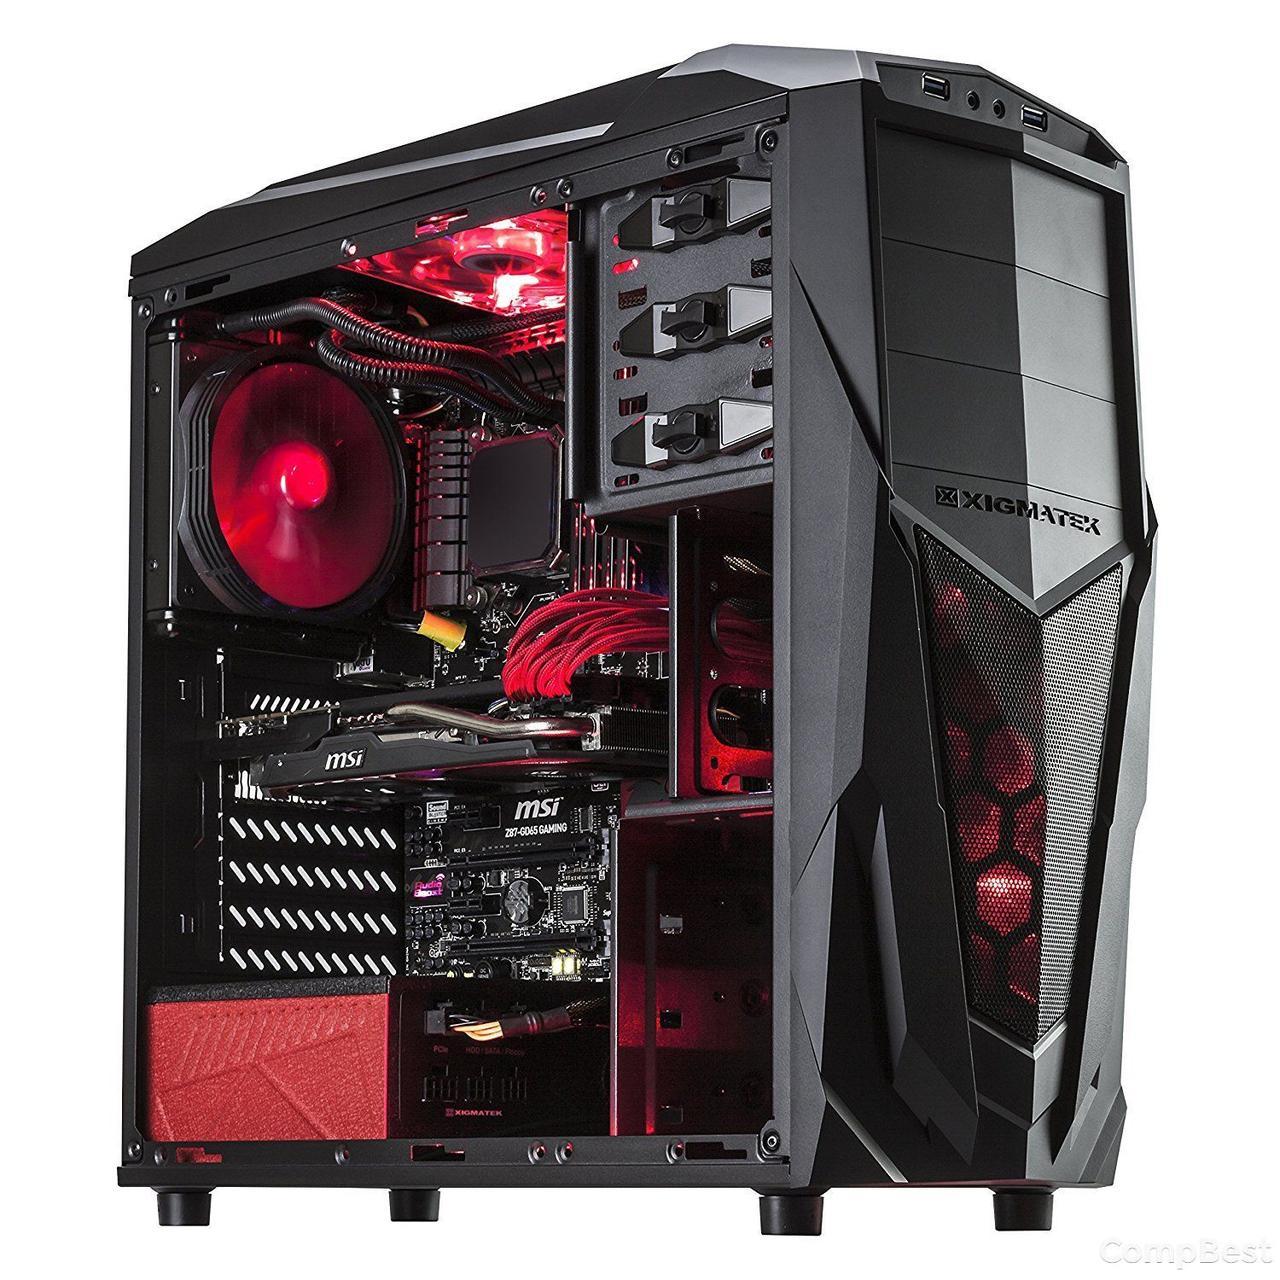 Новый Xigmatek Tower / Intel Core i5-4570 (4 (4) ядра по 3.20-3.60 GHz) / 500GB HDD + Новый 240GB SSD / 16GB DDR3/ USB 3.0, Новый БП 600W Chieftec/